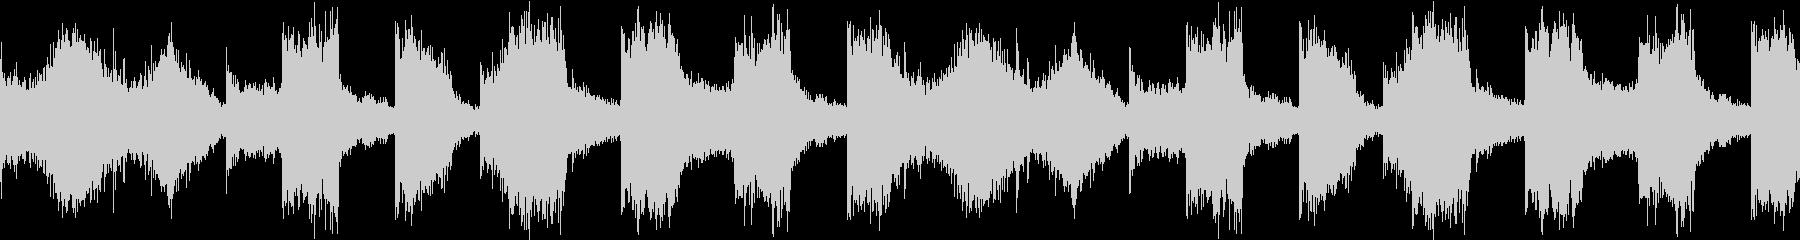 EDM リードシンセ 3 音楽制作用の未再生の波形